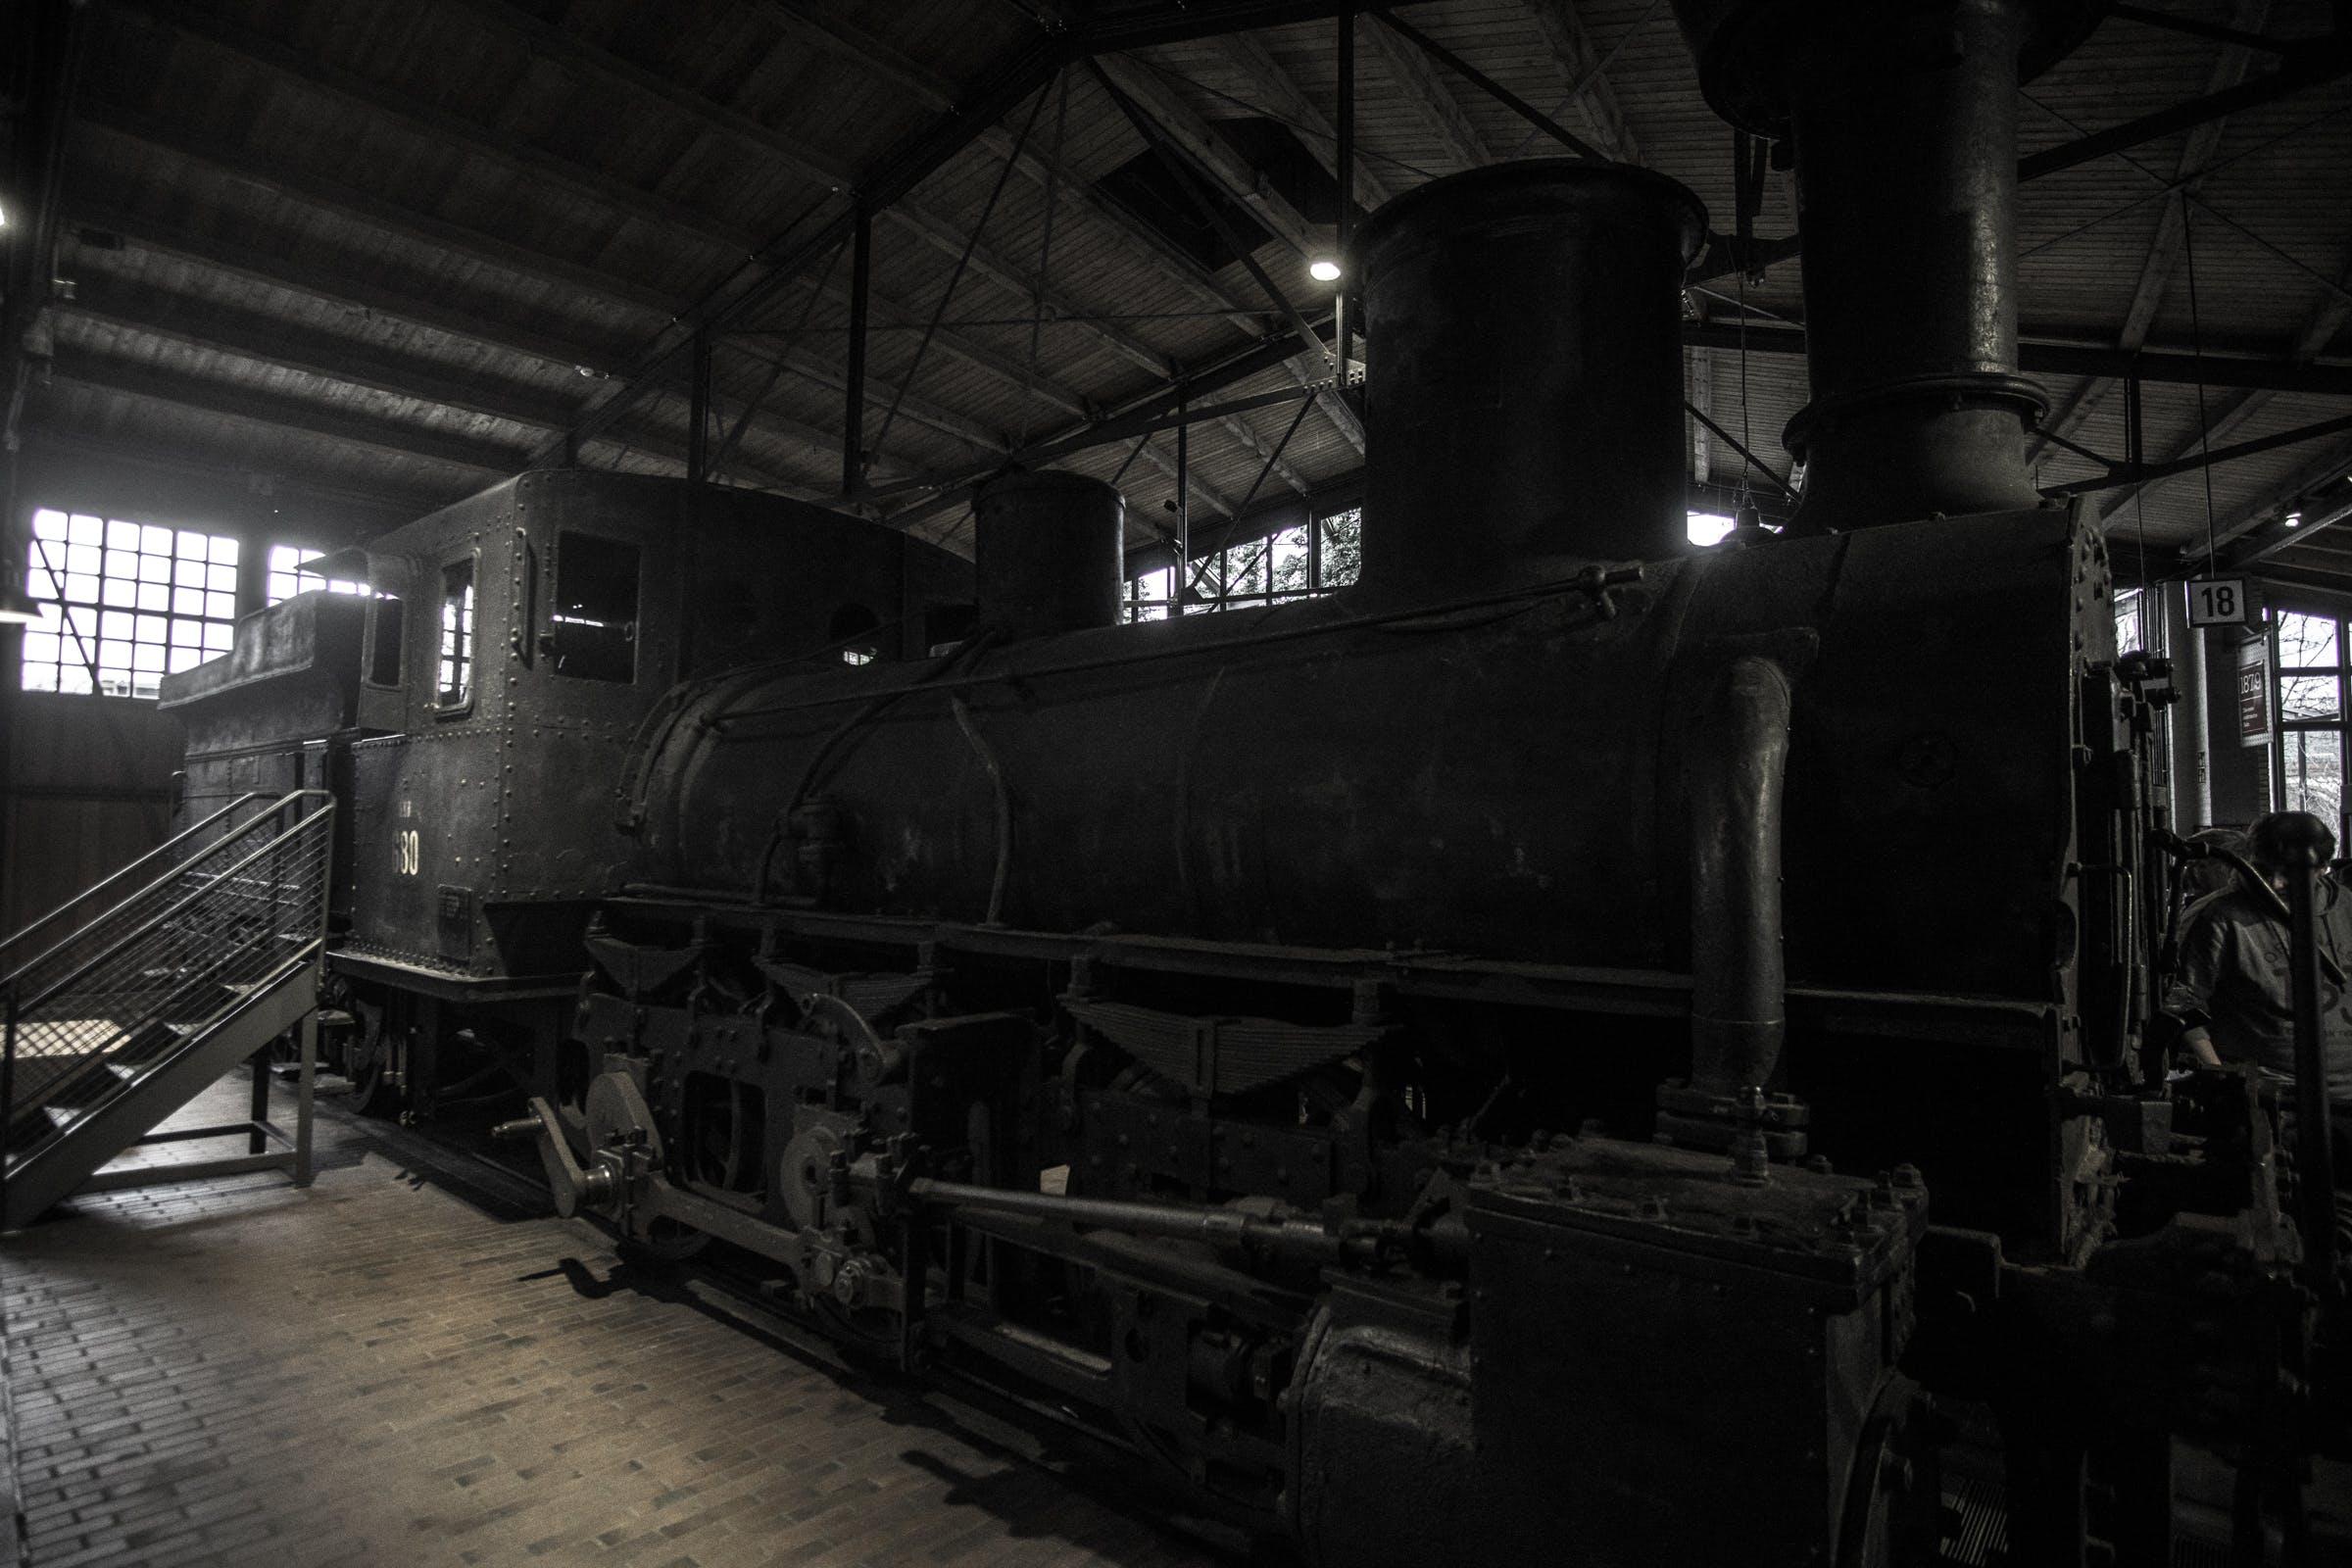 Free stock photo of dark, desaturated, steam locomotive